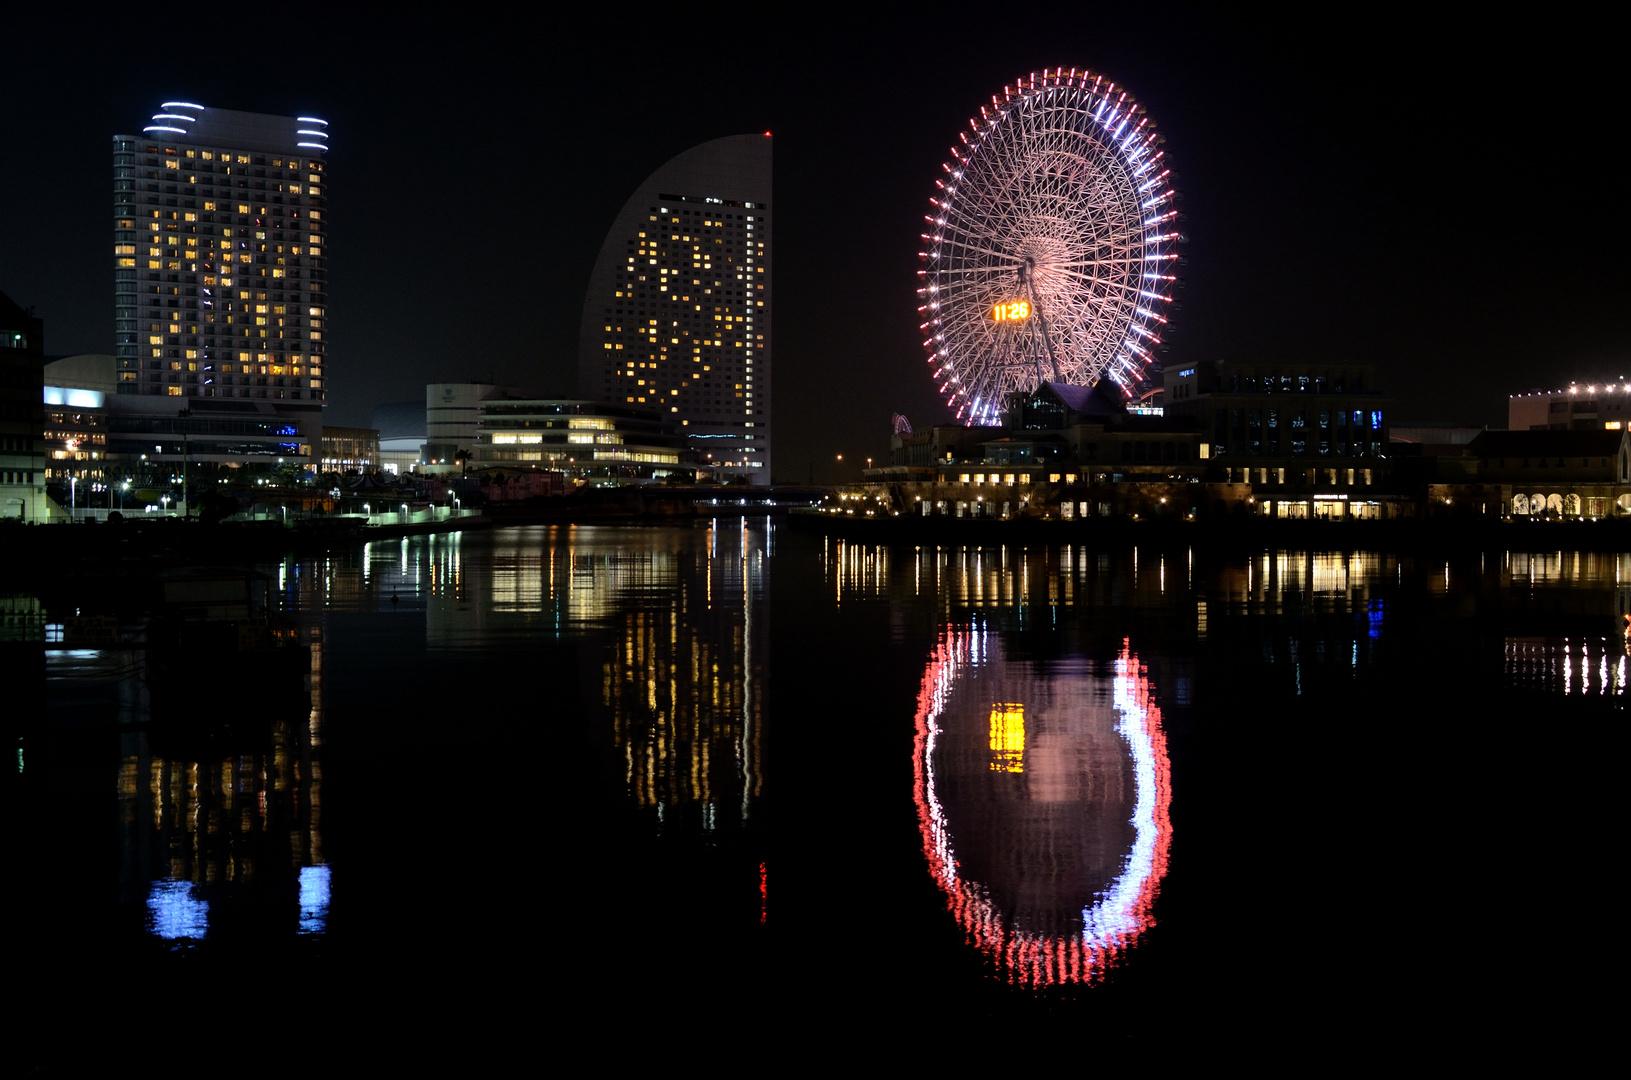 Yokohama 11:26